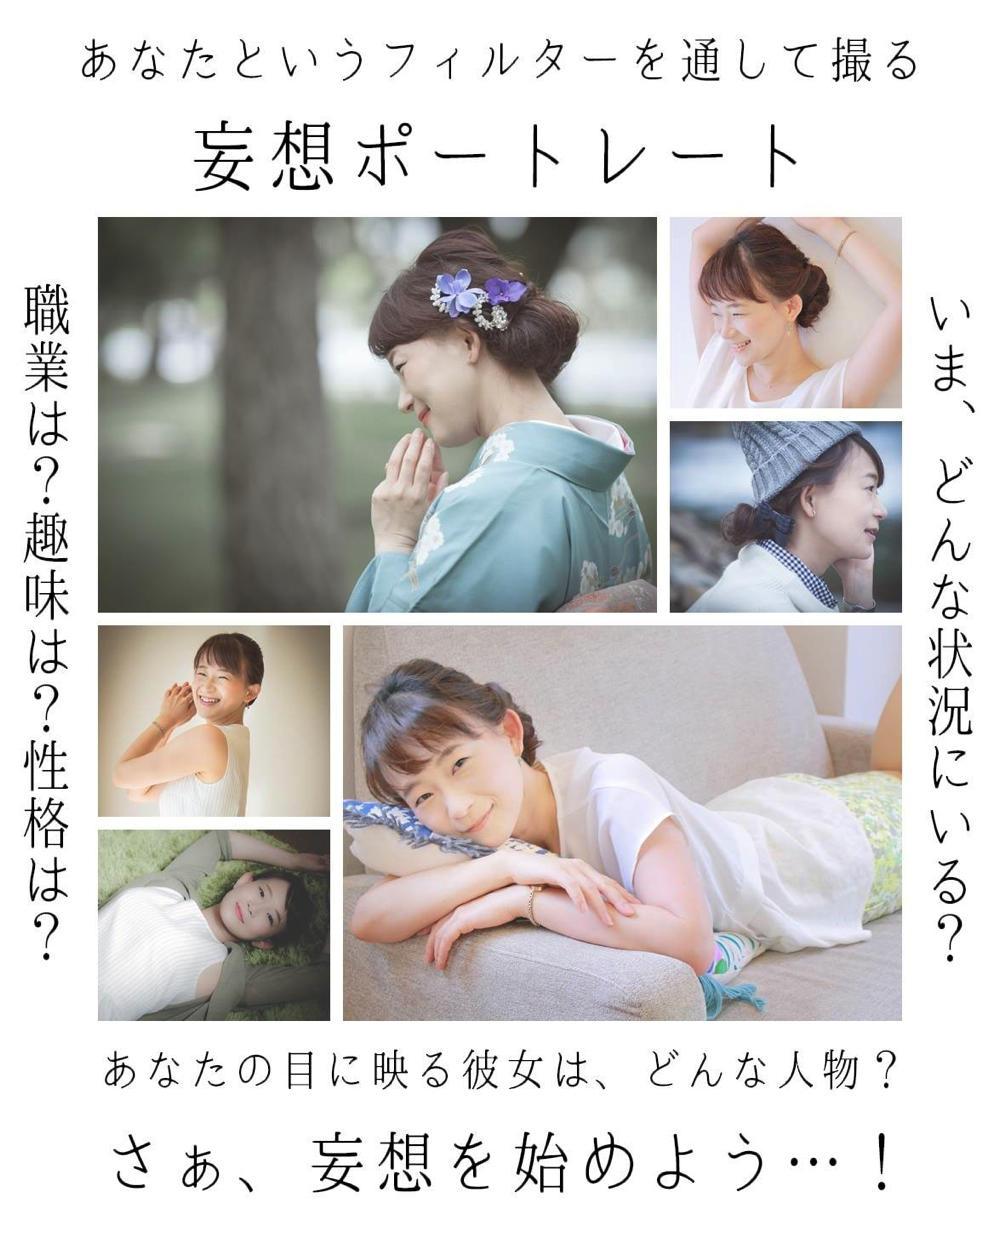 http://coaki.jp/hiroshima/mousou1.jpg